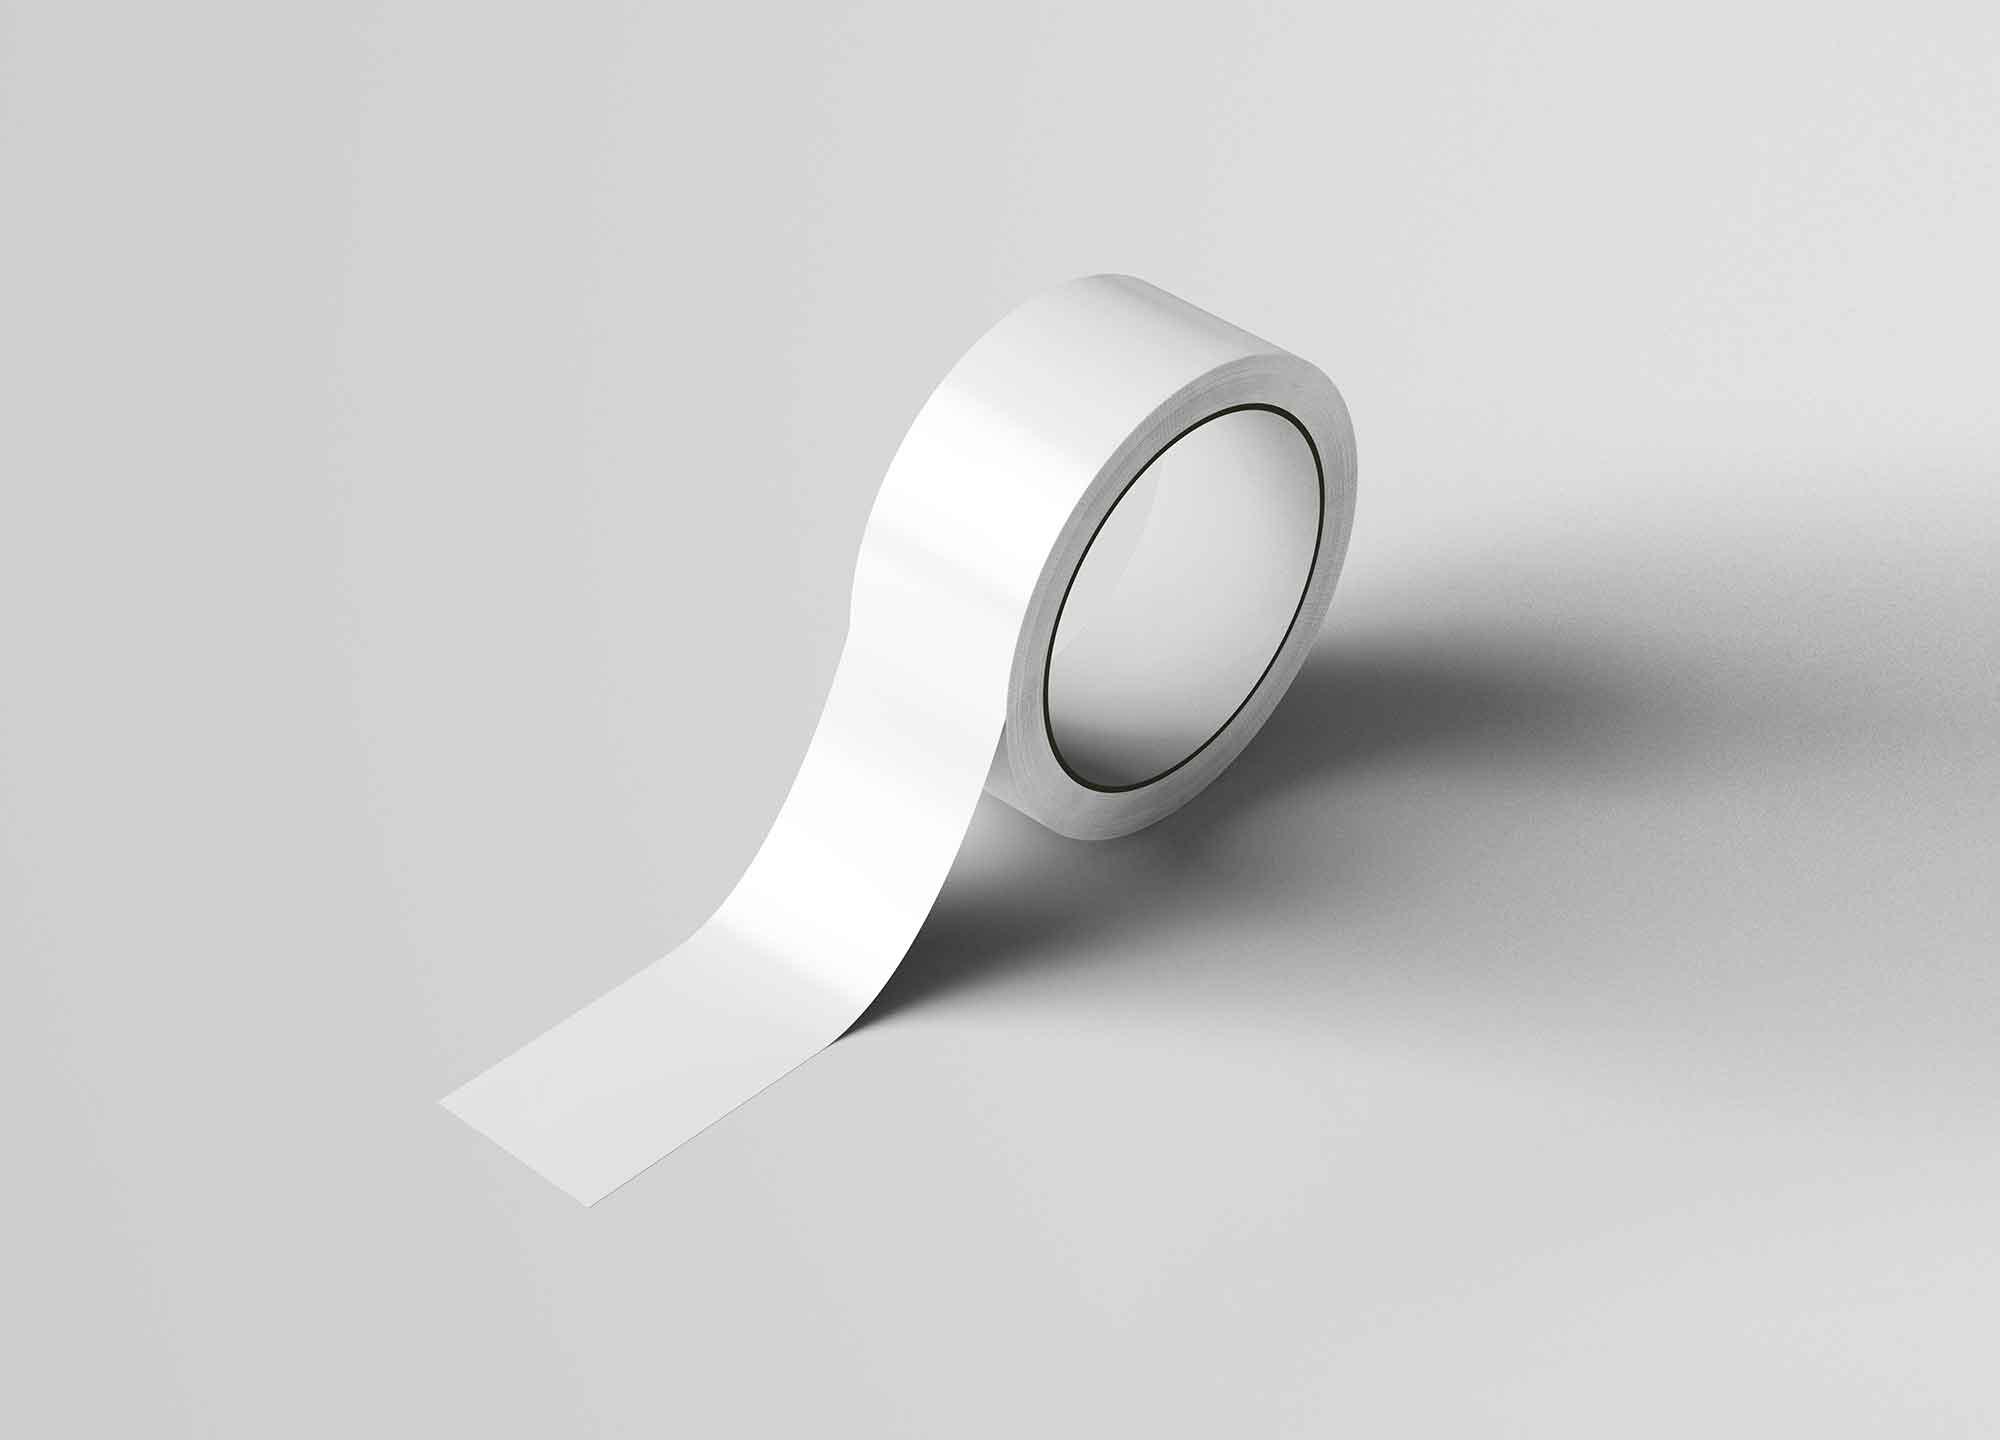 Realistic Duct Tape Mockup 2